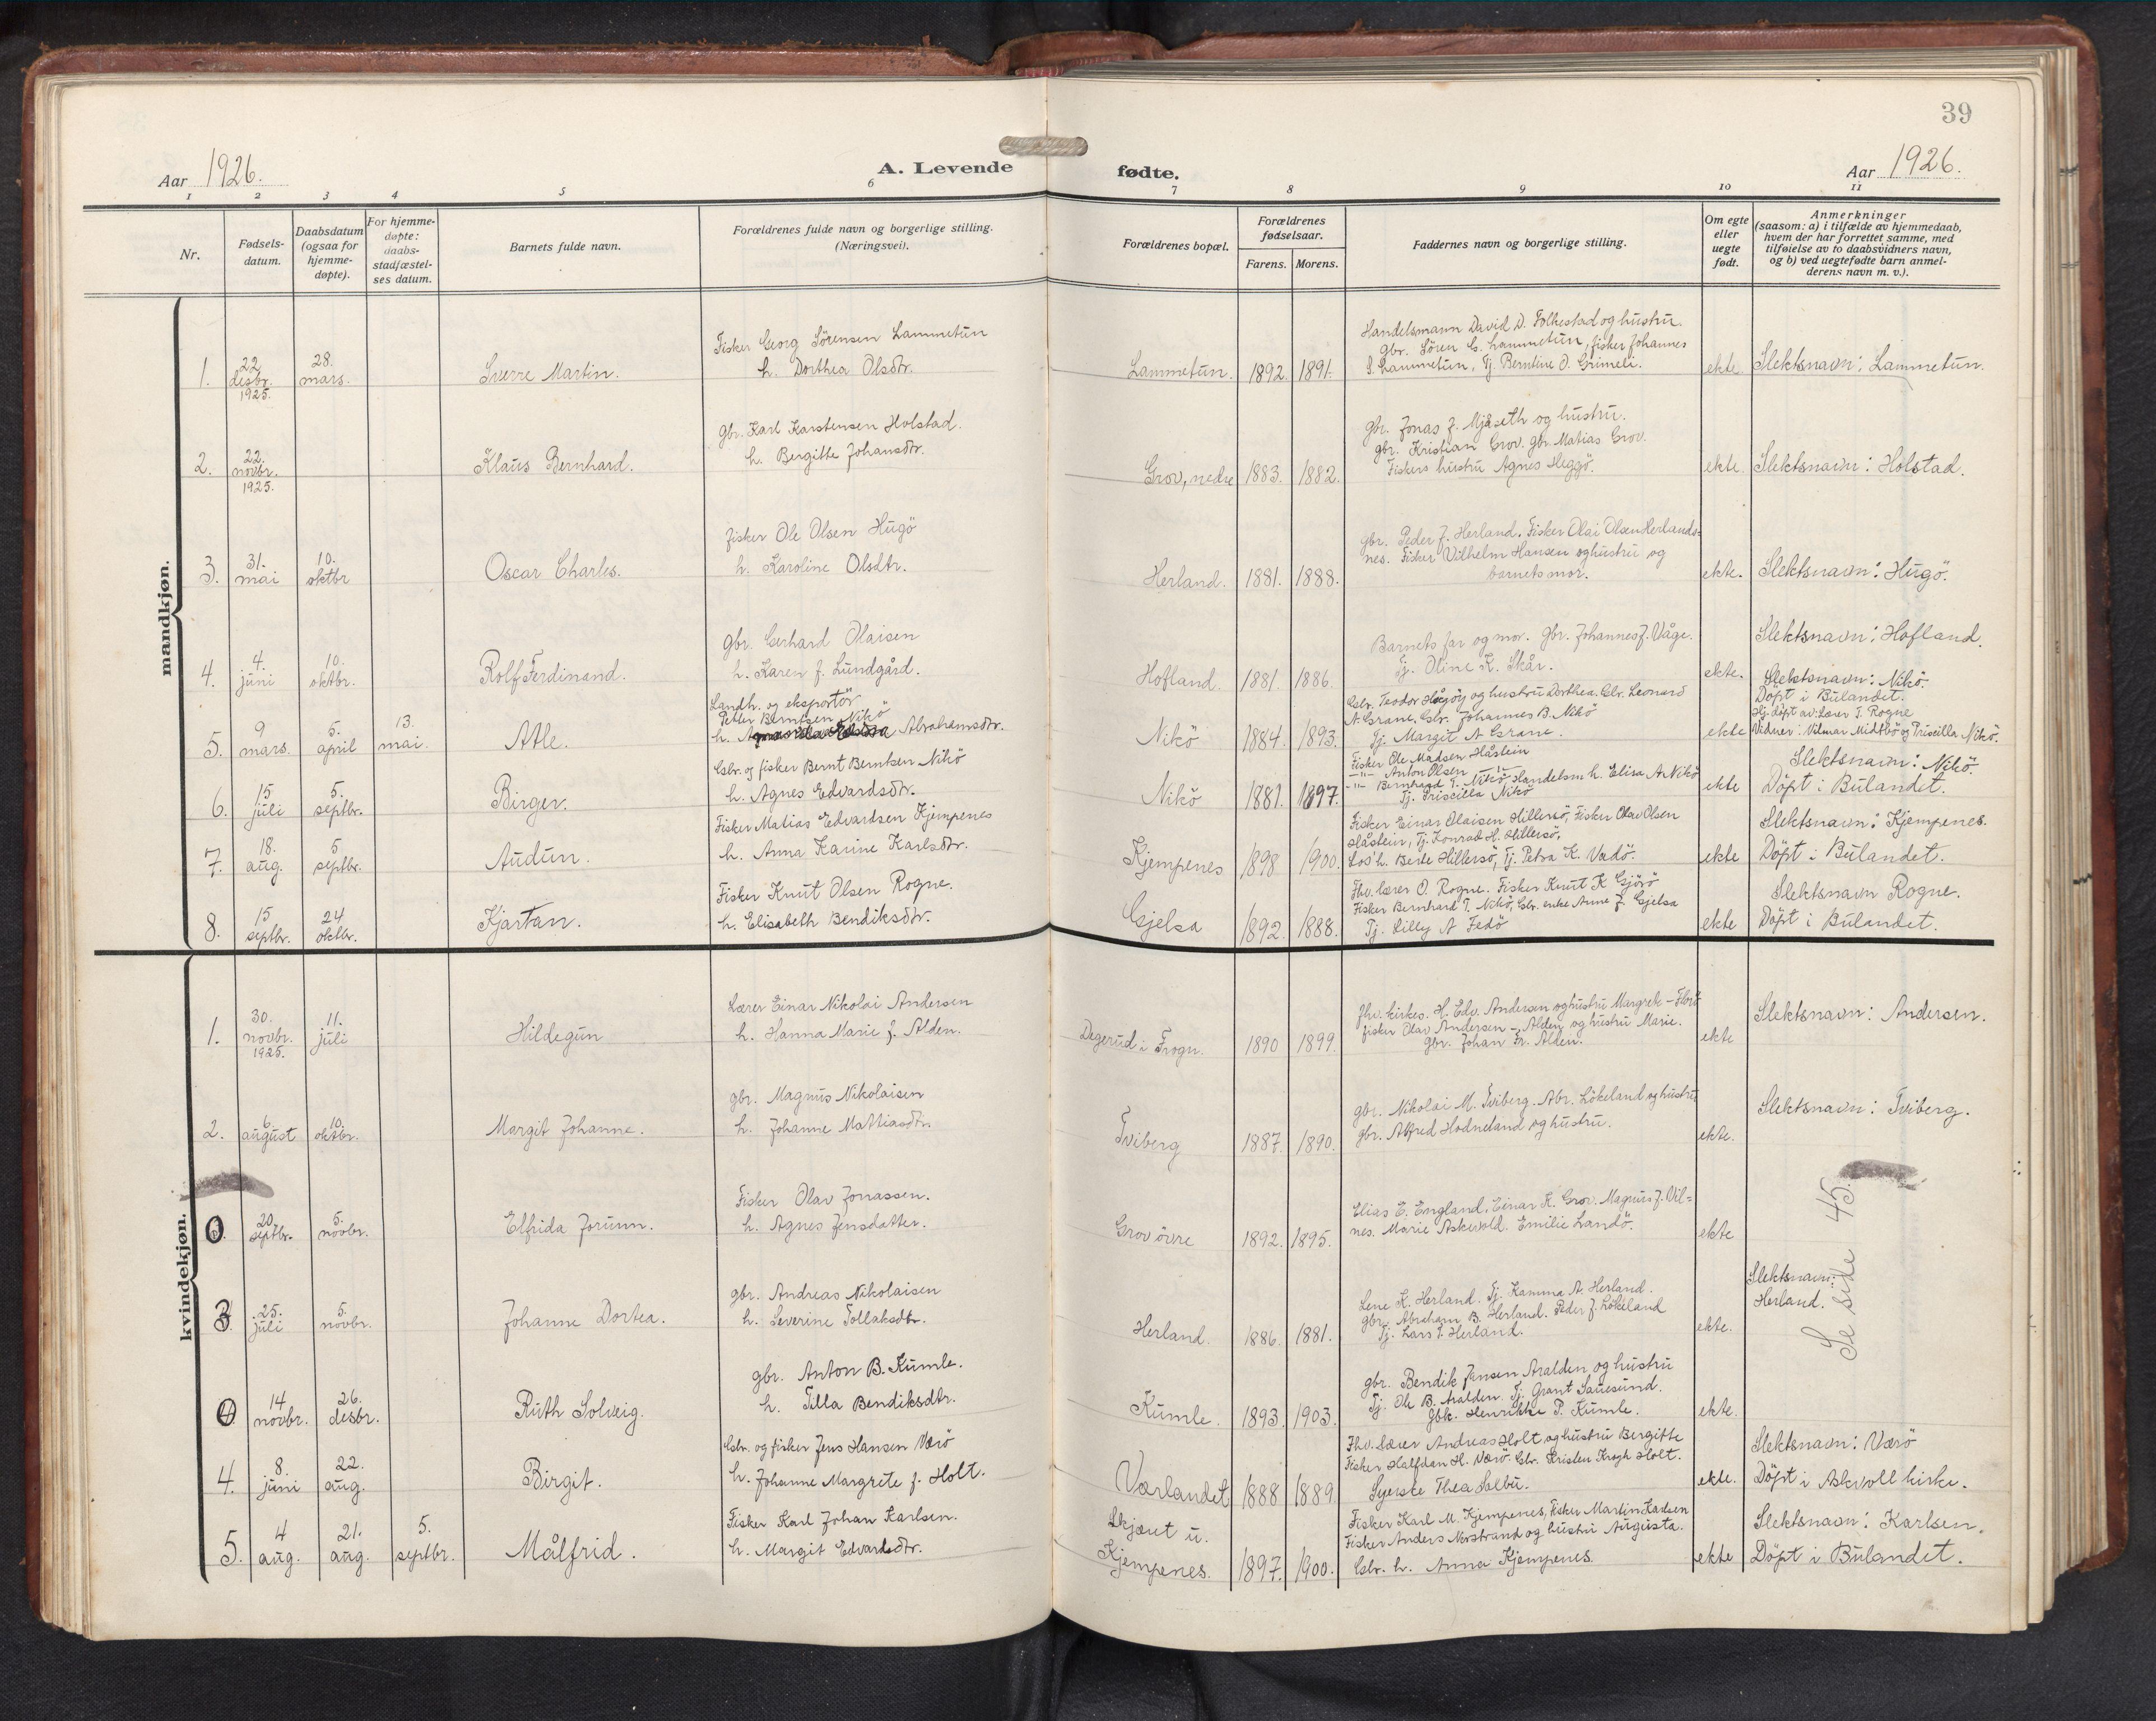 SAB, Askvoll sokneprestembete, H/Hab/Habb/L0002: Klokkerbok nr. B 2, 1910-1947, s. 38b-39a